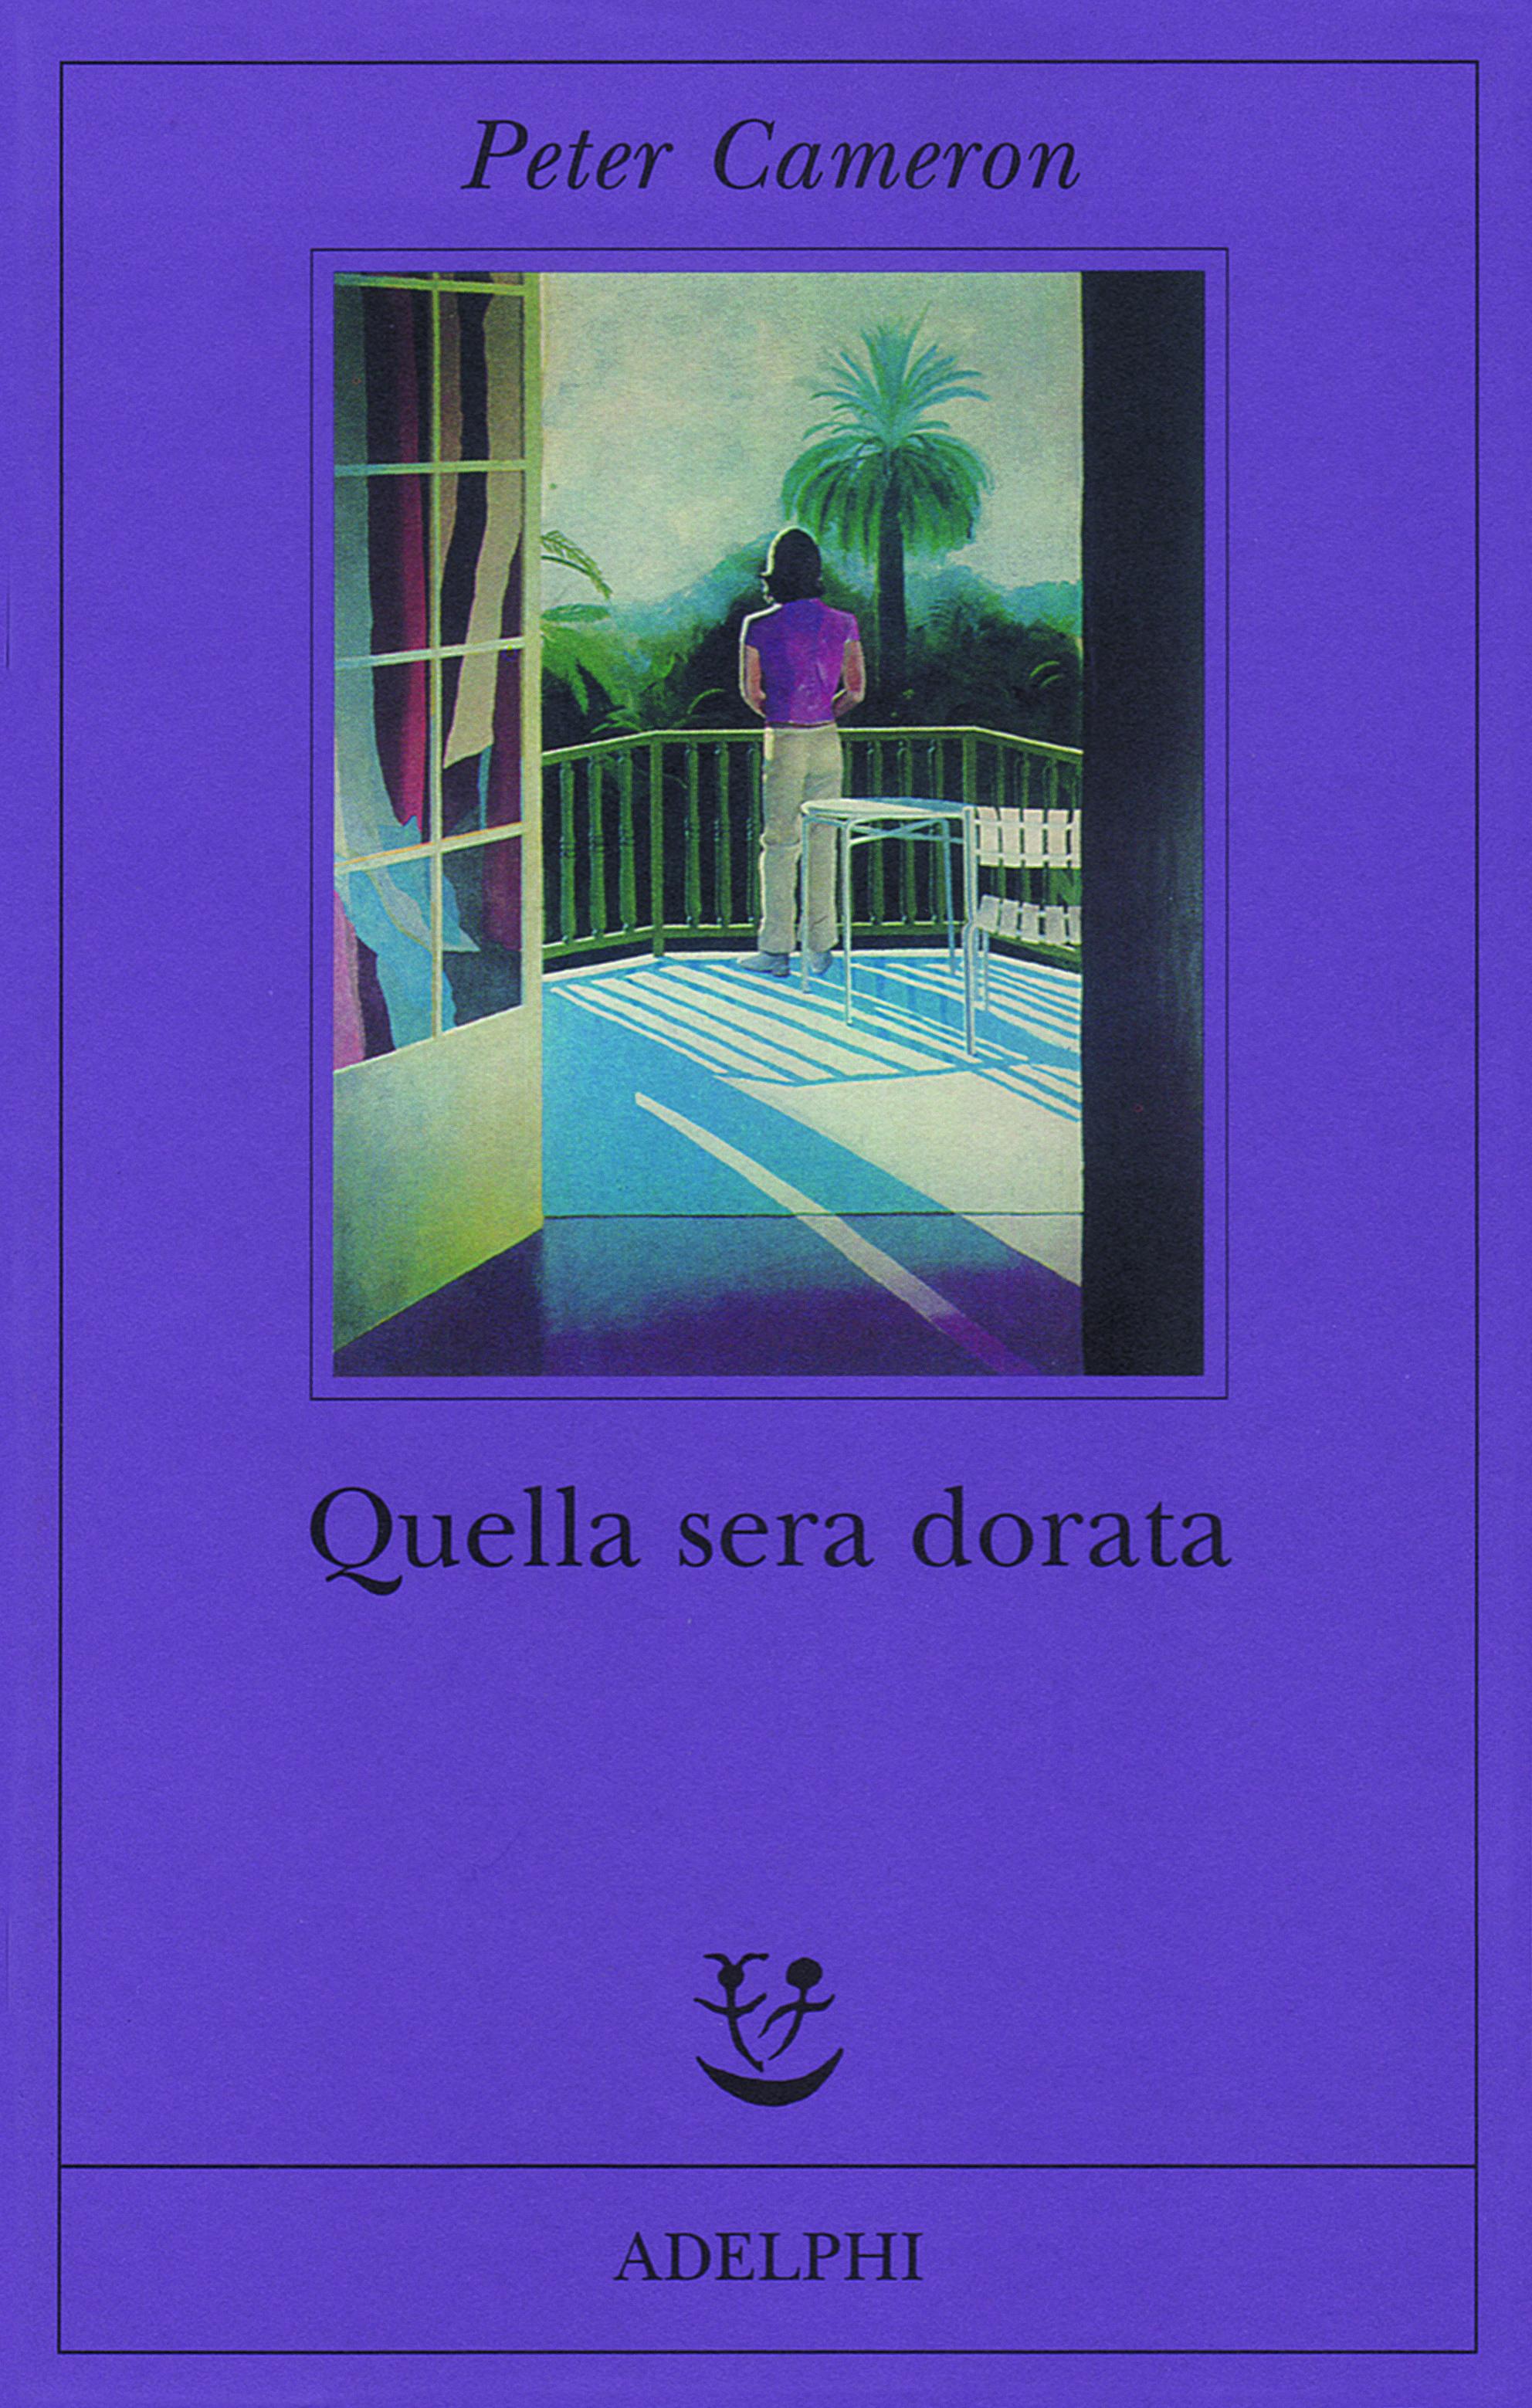 Quella sera dorata, The City of Your Final Destination published in Italian by Adelphi